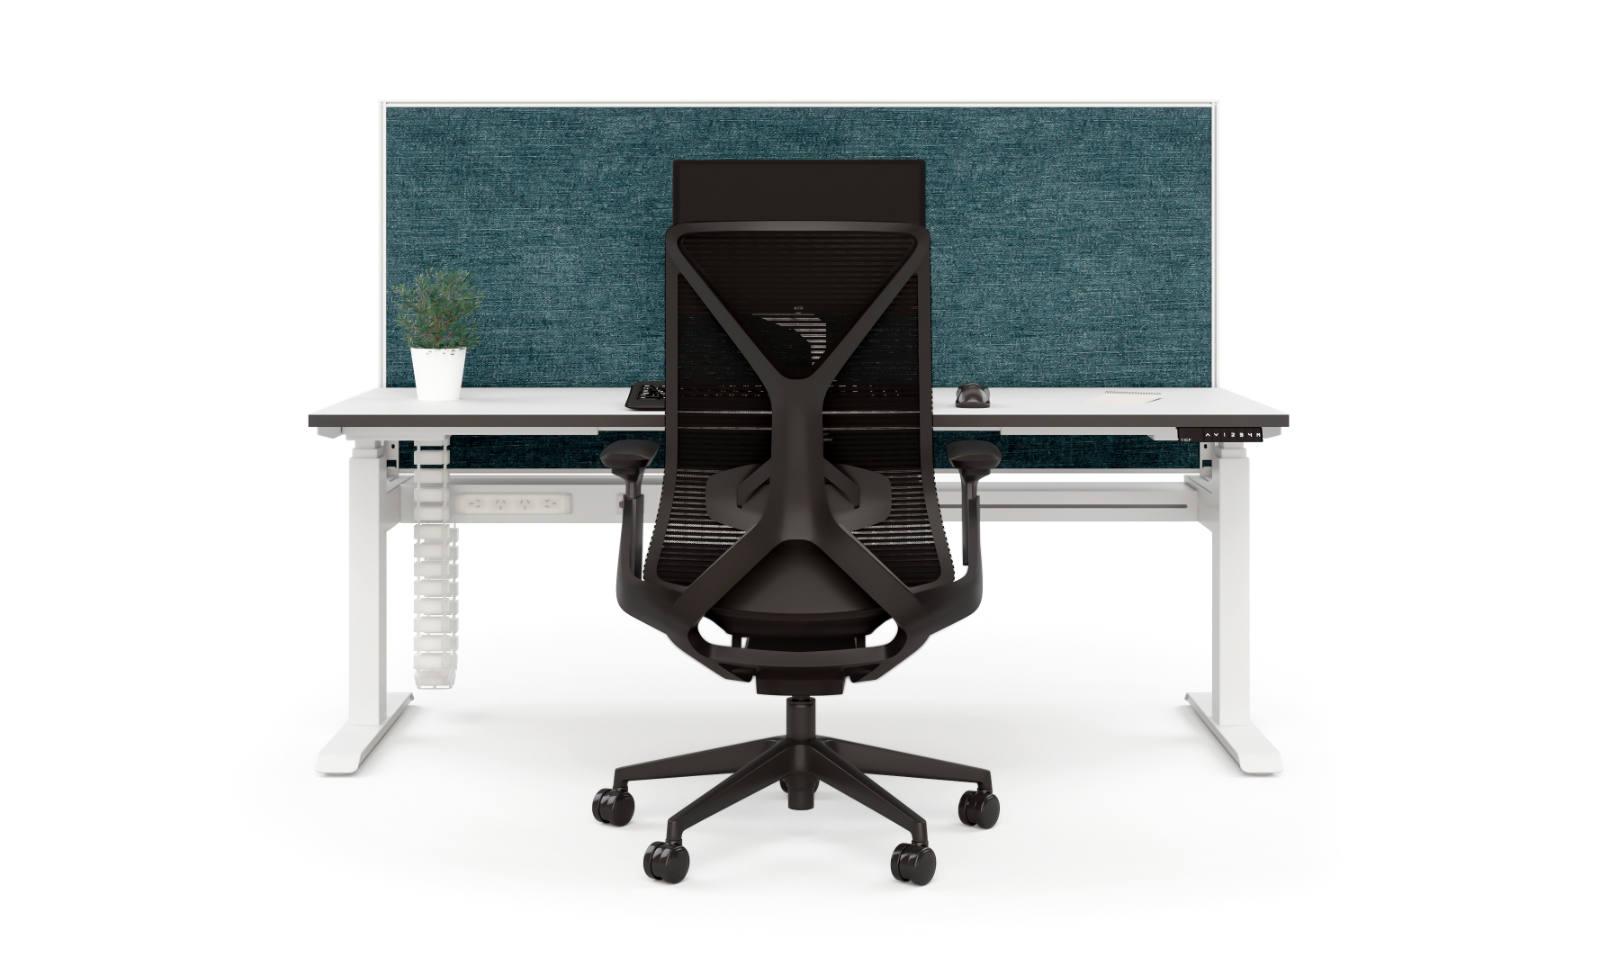 height adjustable desk with rectangular legs